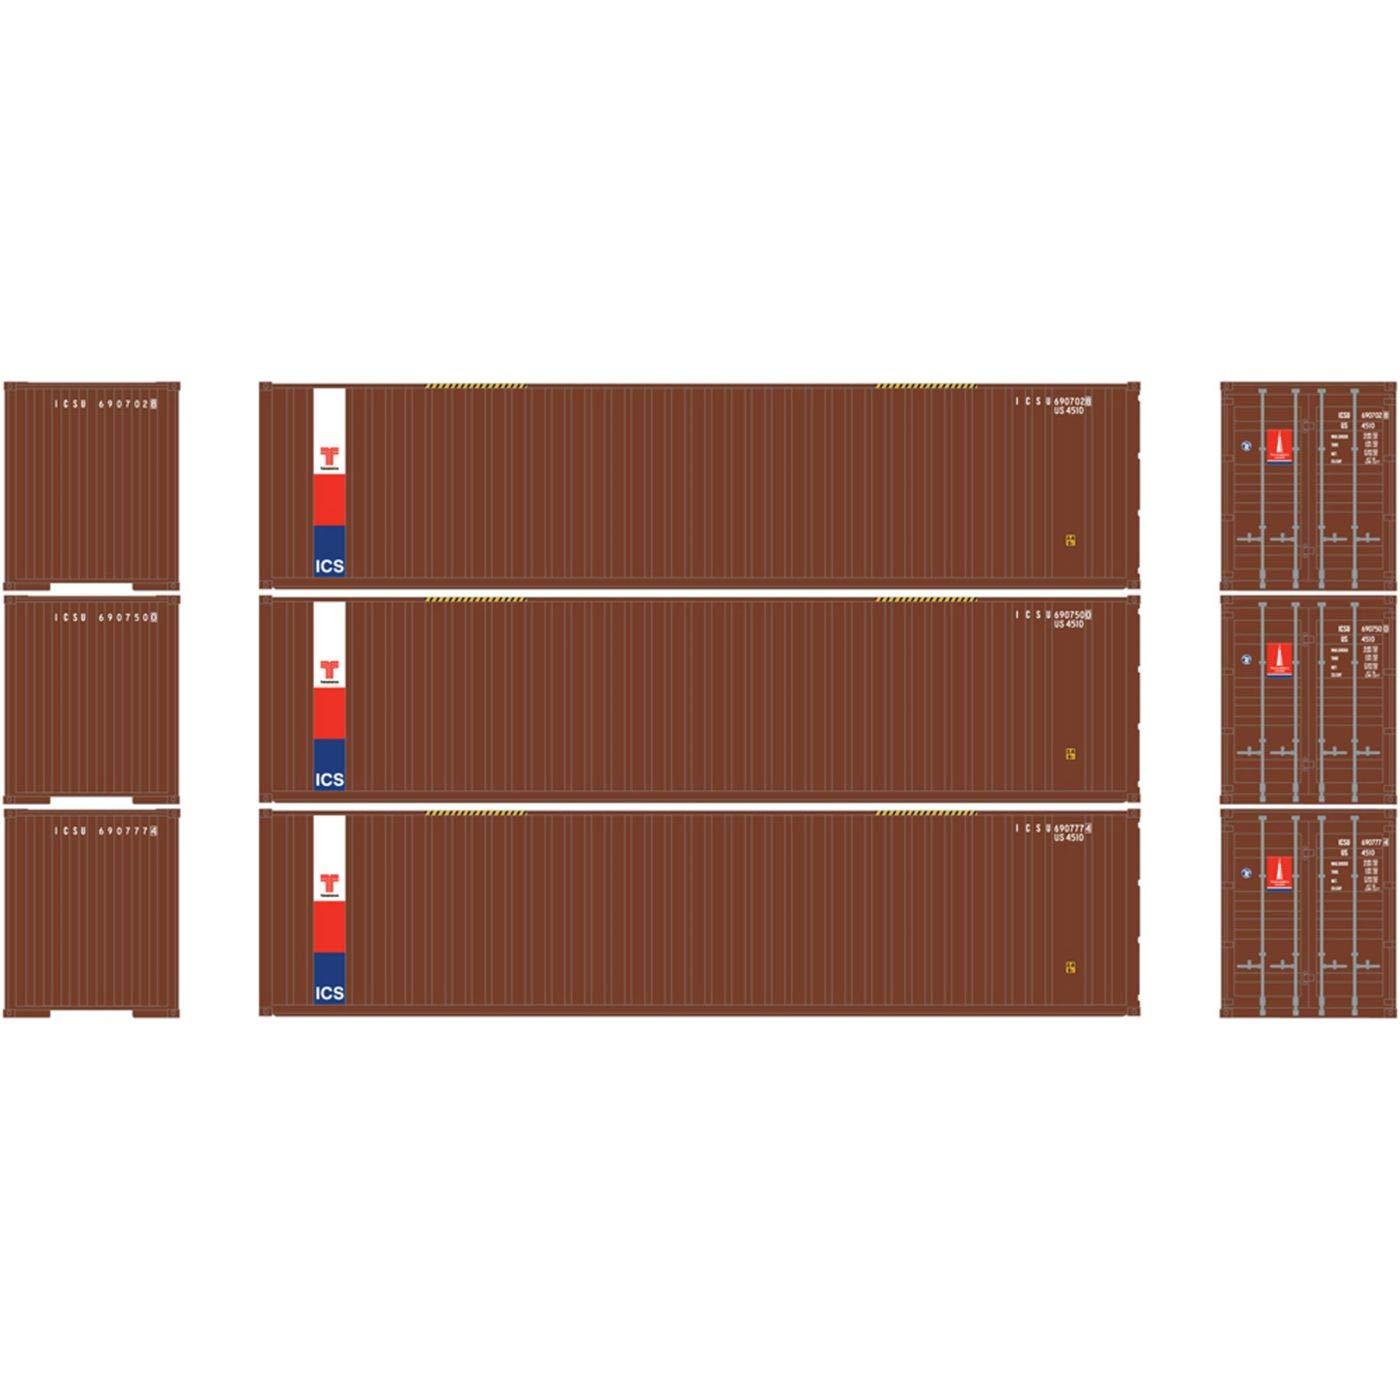 HO RTR 40フィート リブコンテナ フラットパネルトランザム付き (3)   B07687VFMB